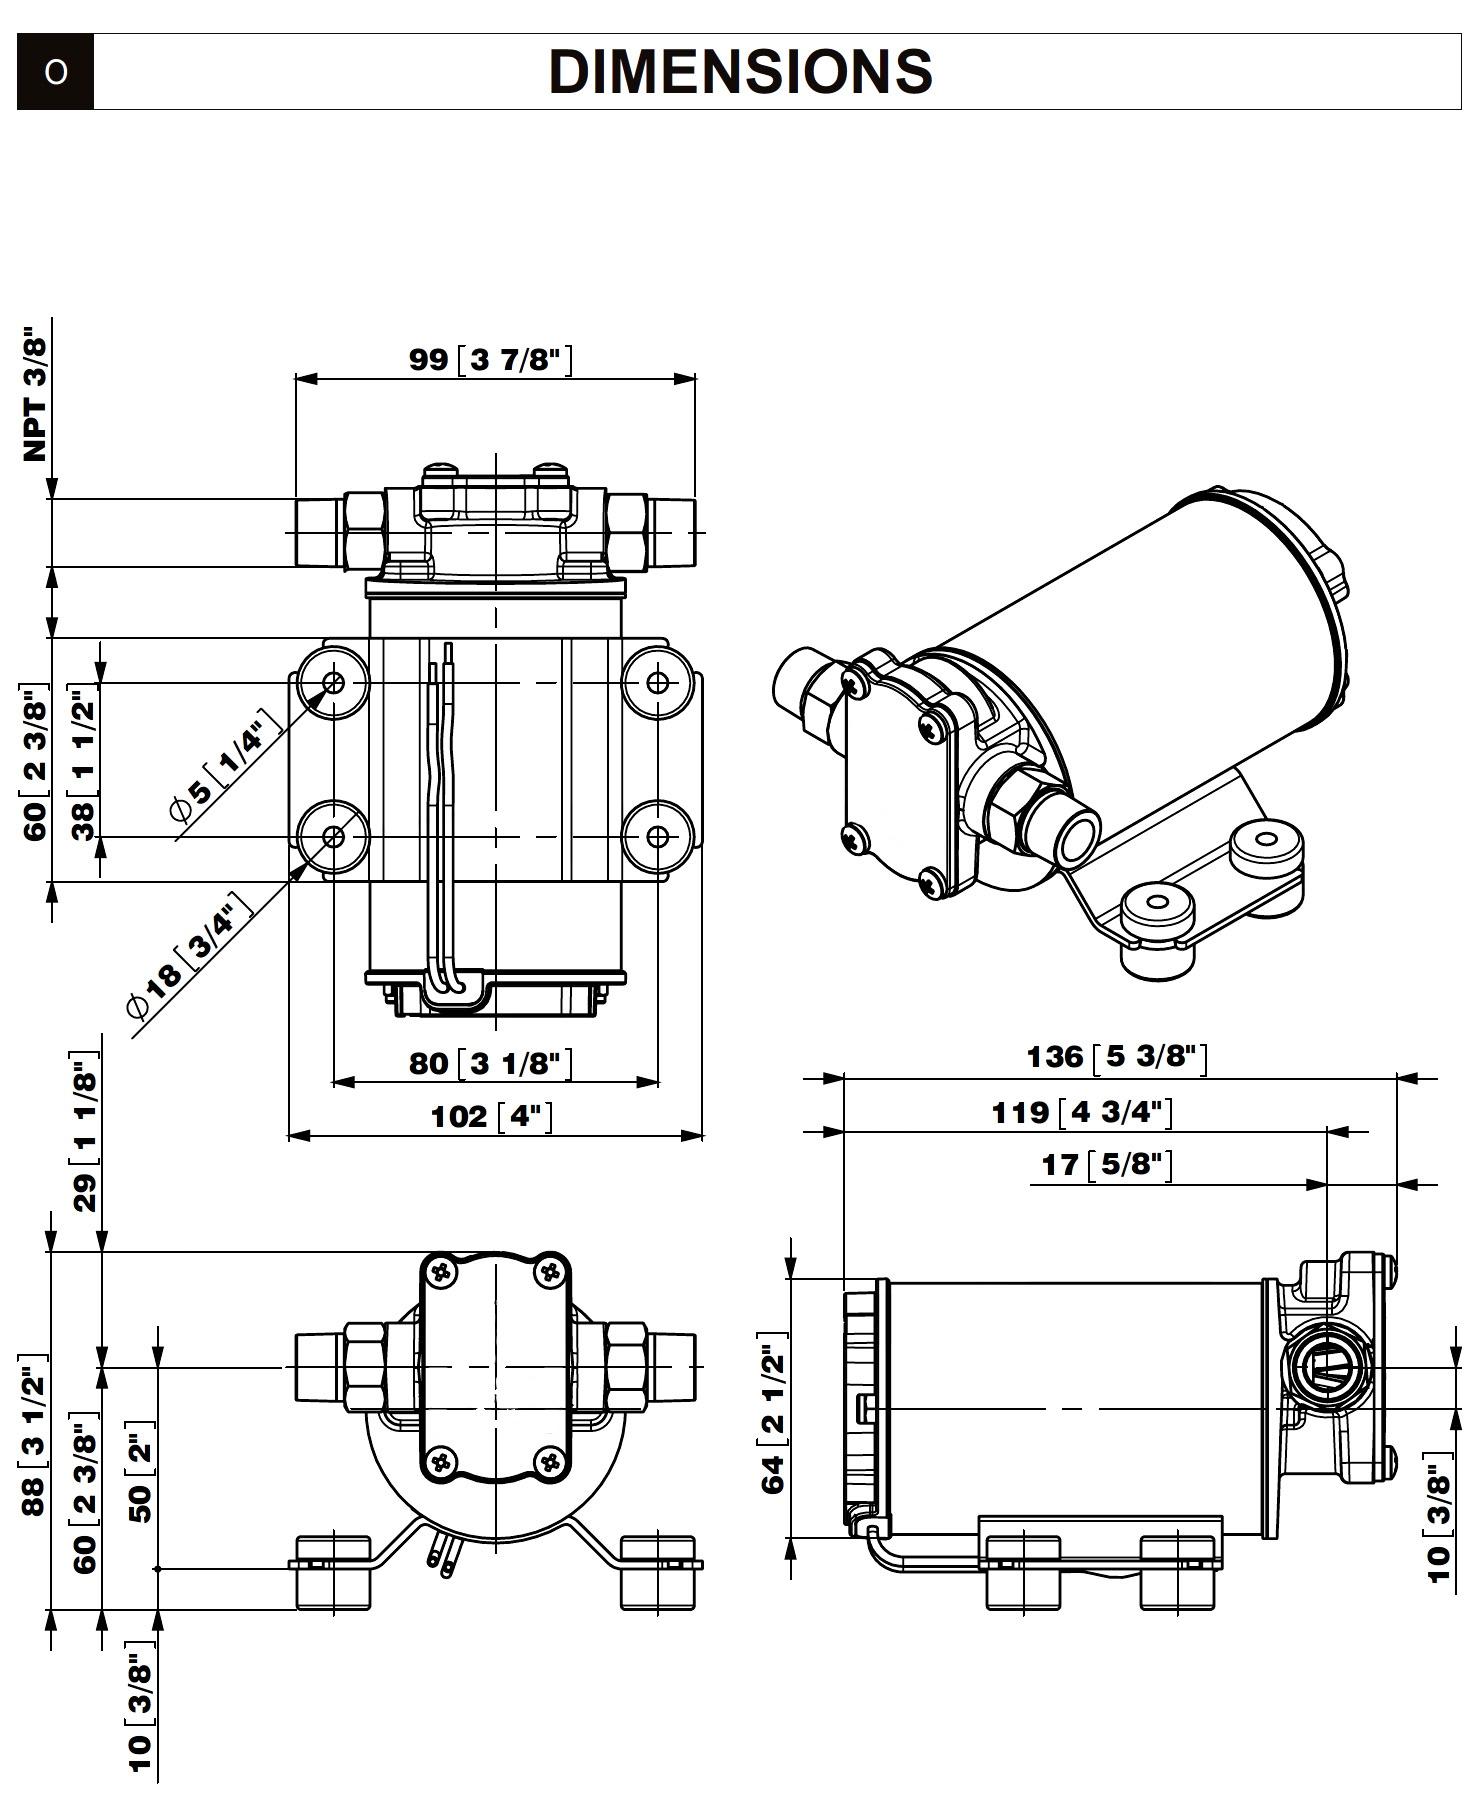 gp-301h-dimensions.jpg